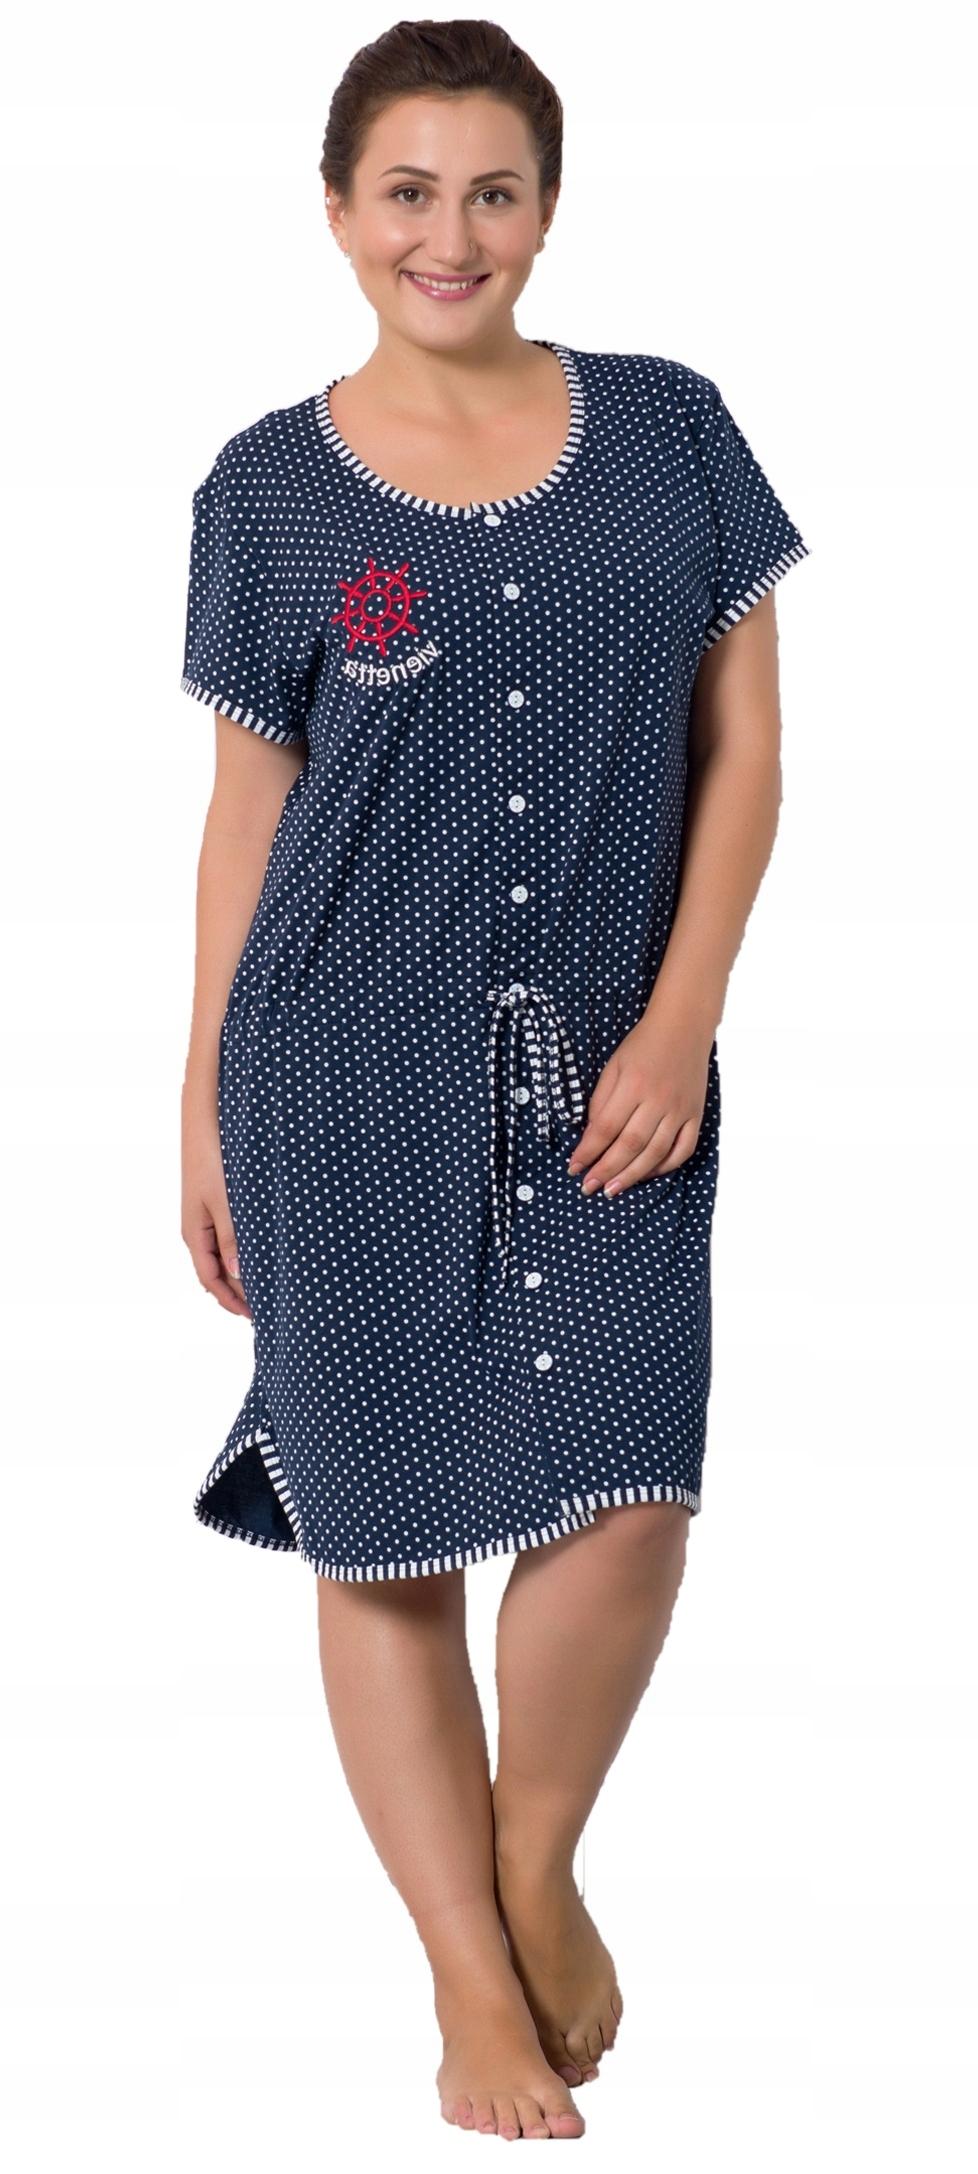 b550ef31787f60 Koszula Nocna Vienetta Secret 4XL 56 58 ** - 7446380063 - oficjalne ...